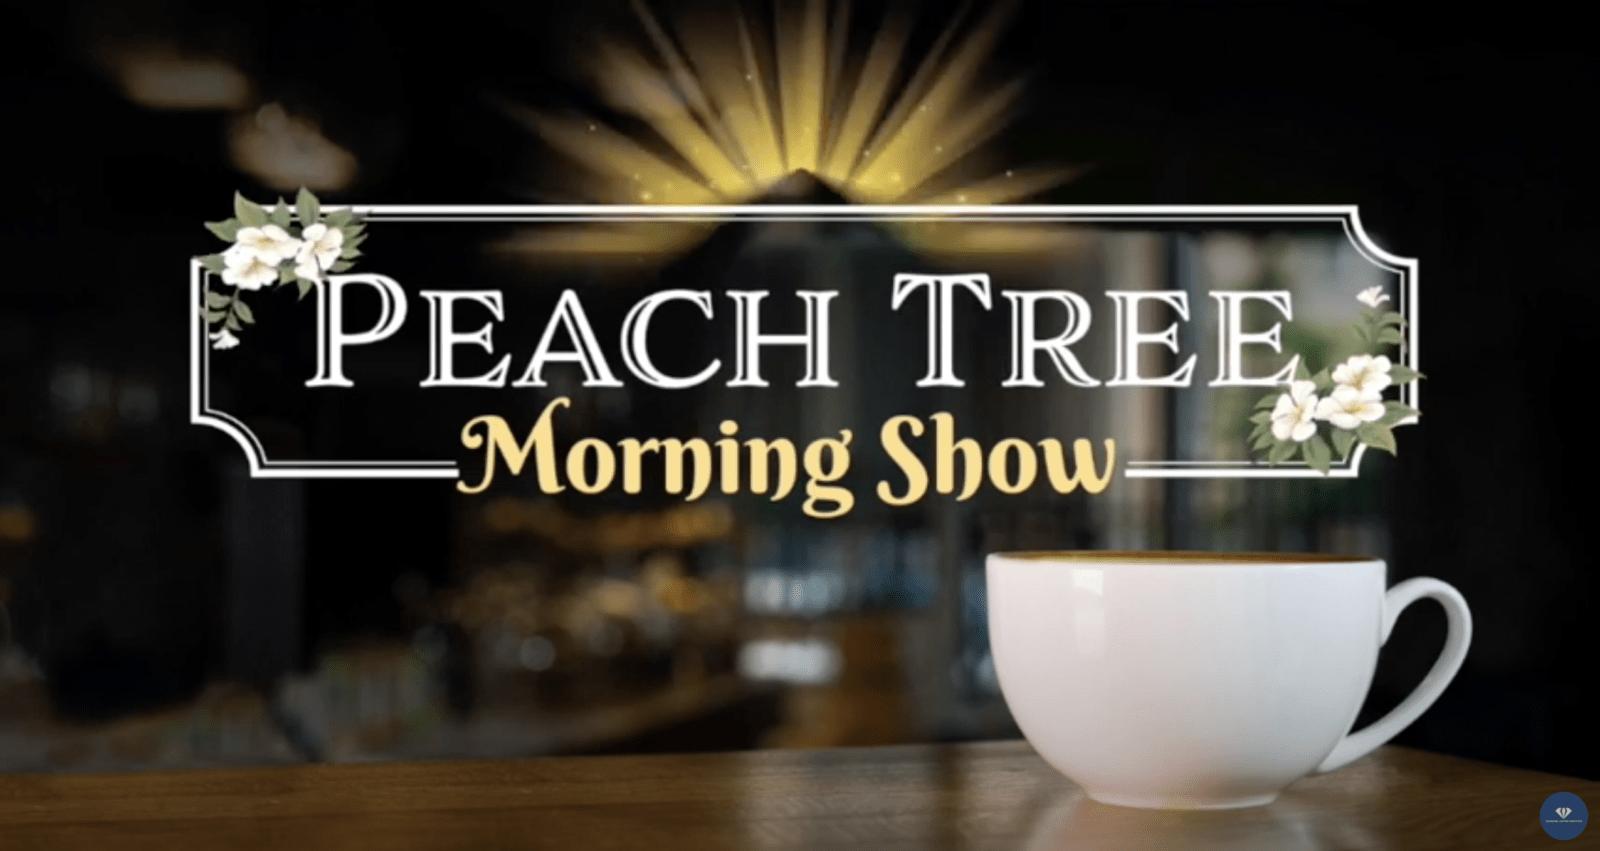 Peach Tree Morning Show on youtube